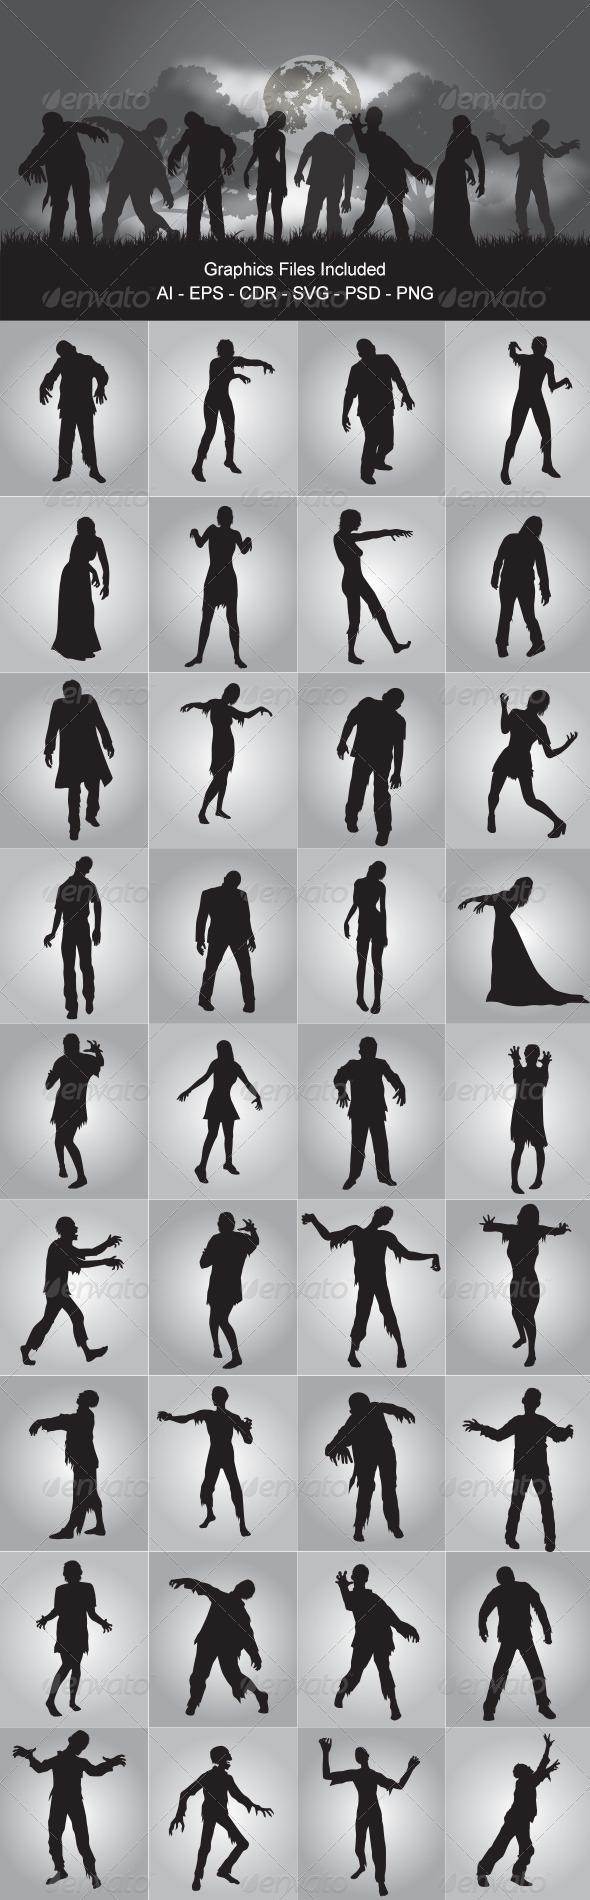 GraphicRiver Zombie Silhouettes 6053591